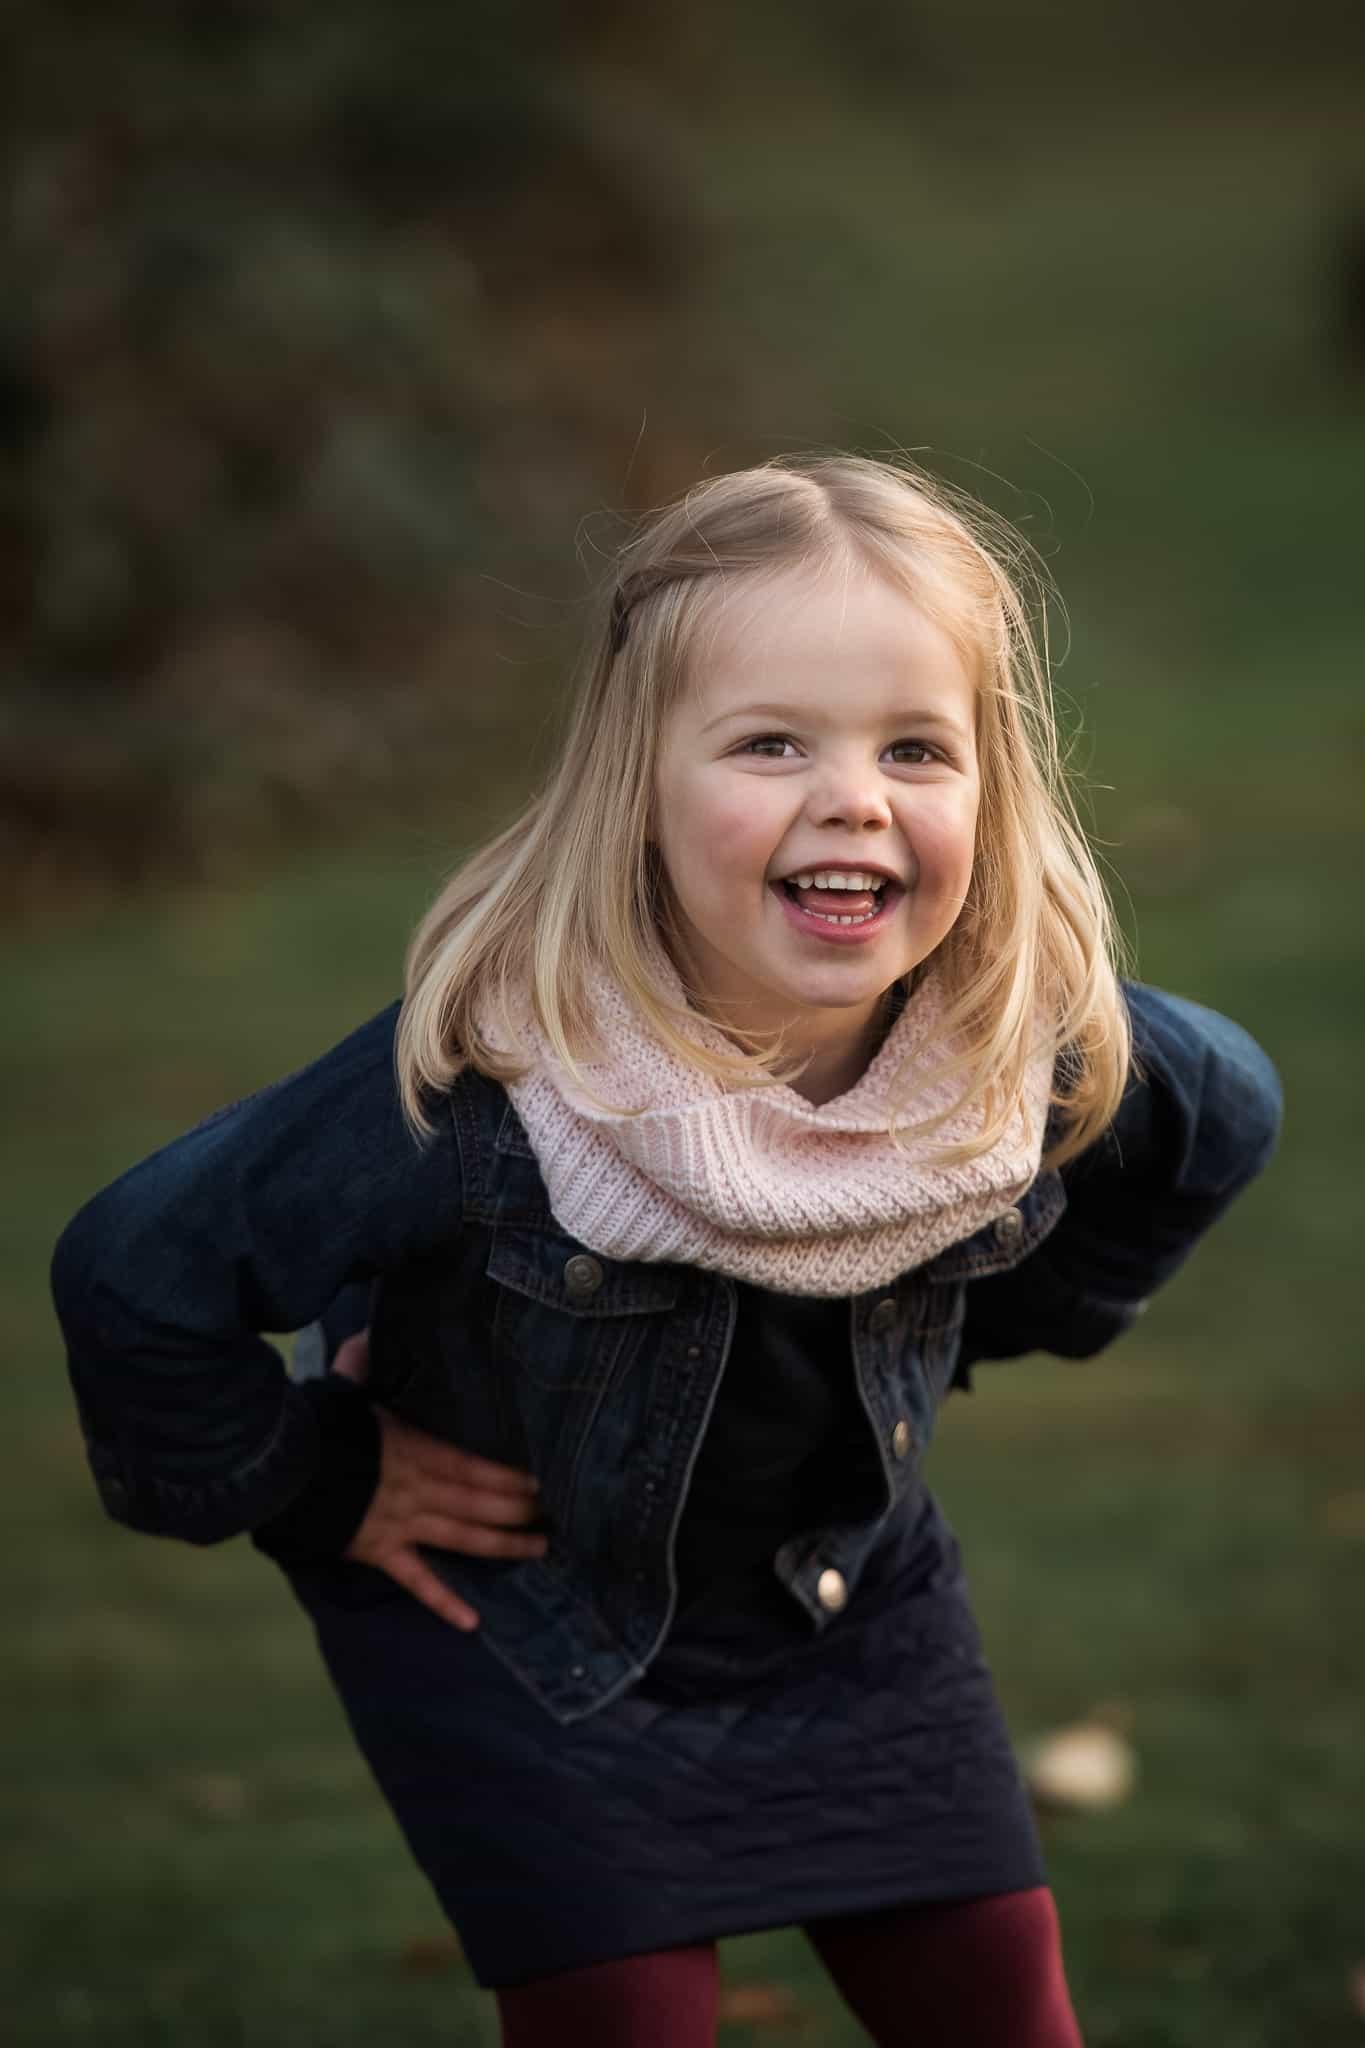 toddler girl bending over laughing